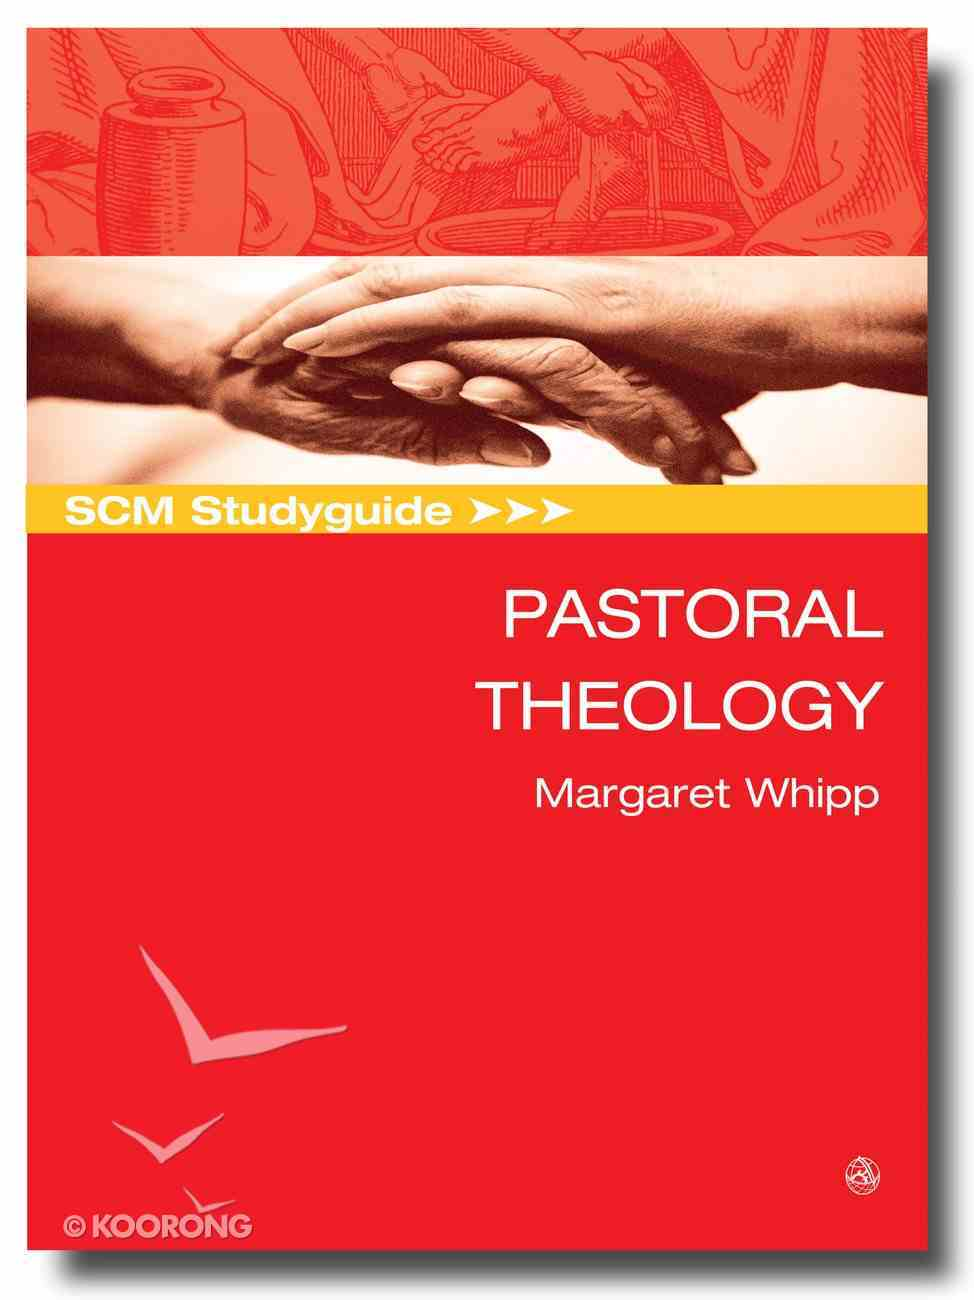 Scm Study Guide: Pastoral Theology (Scm Studyguide Series) Paperback